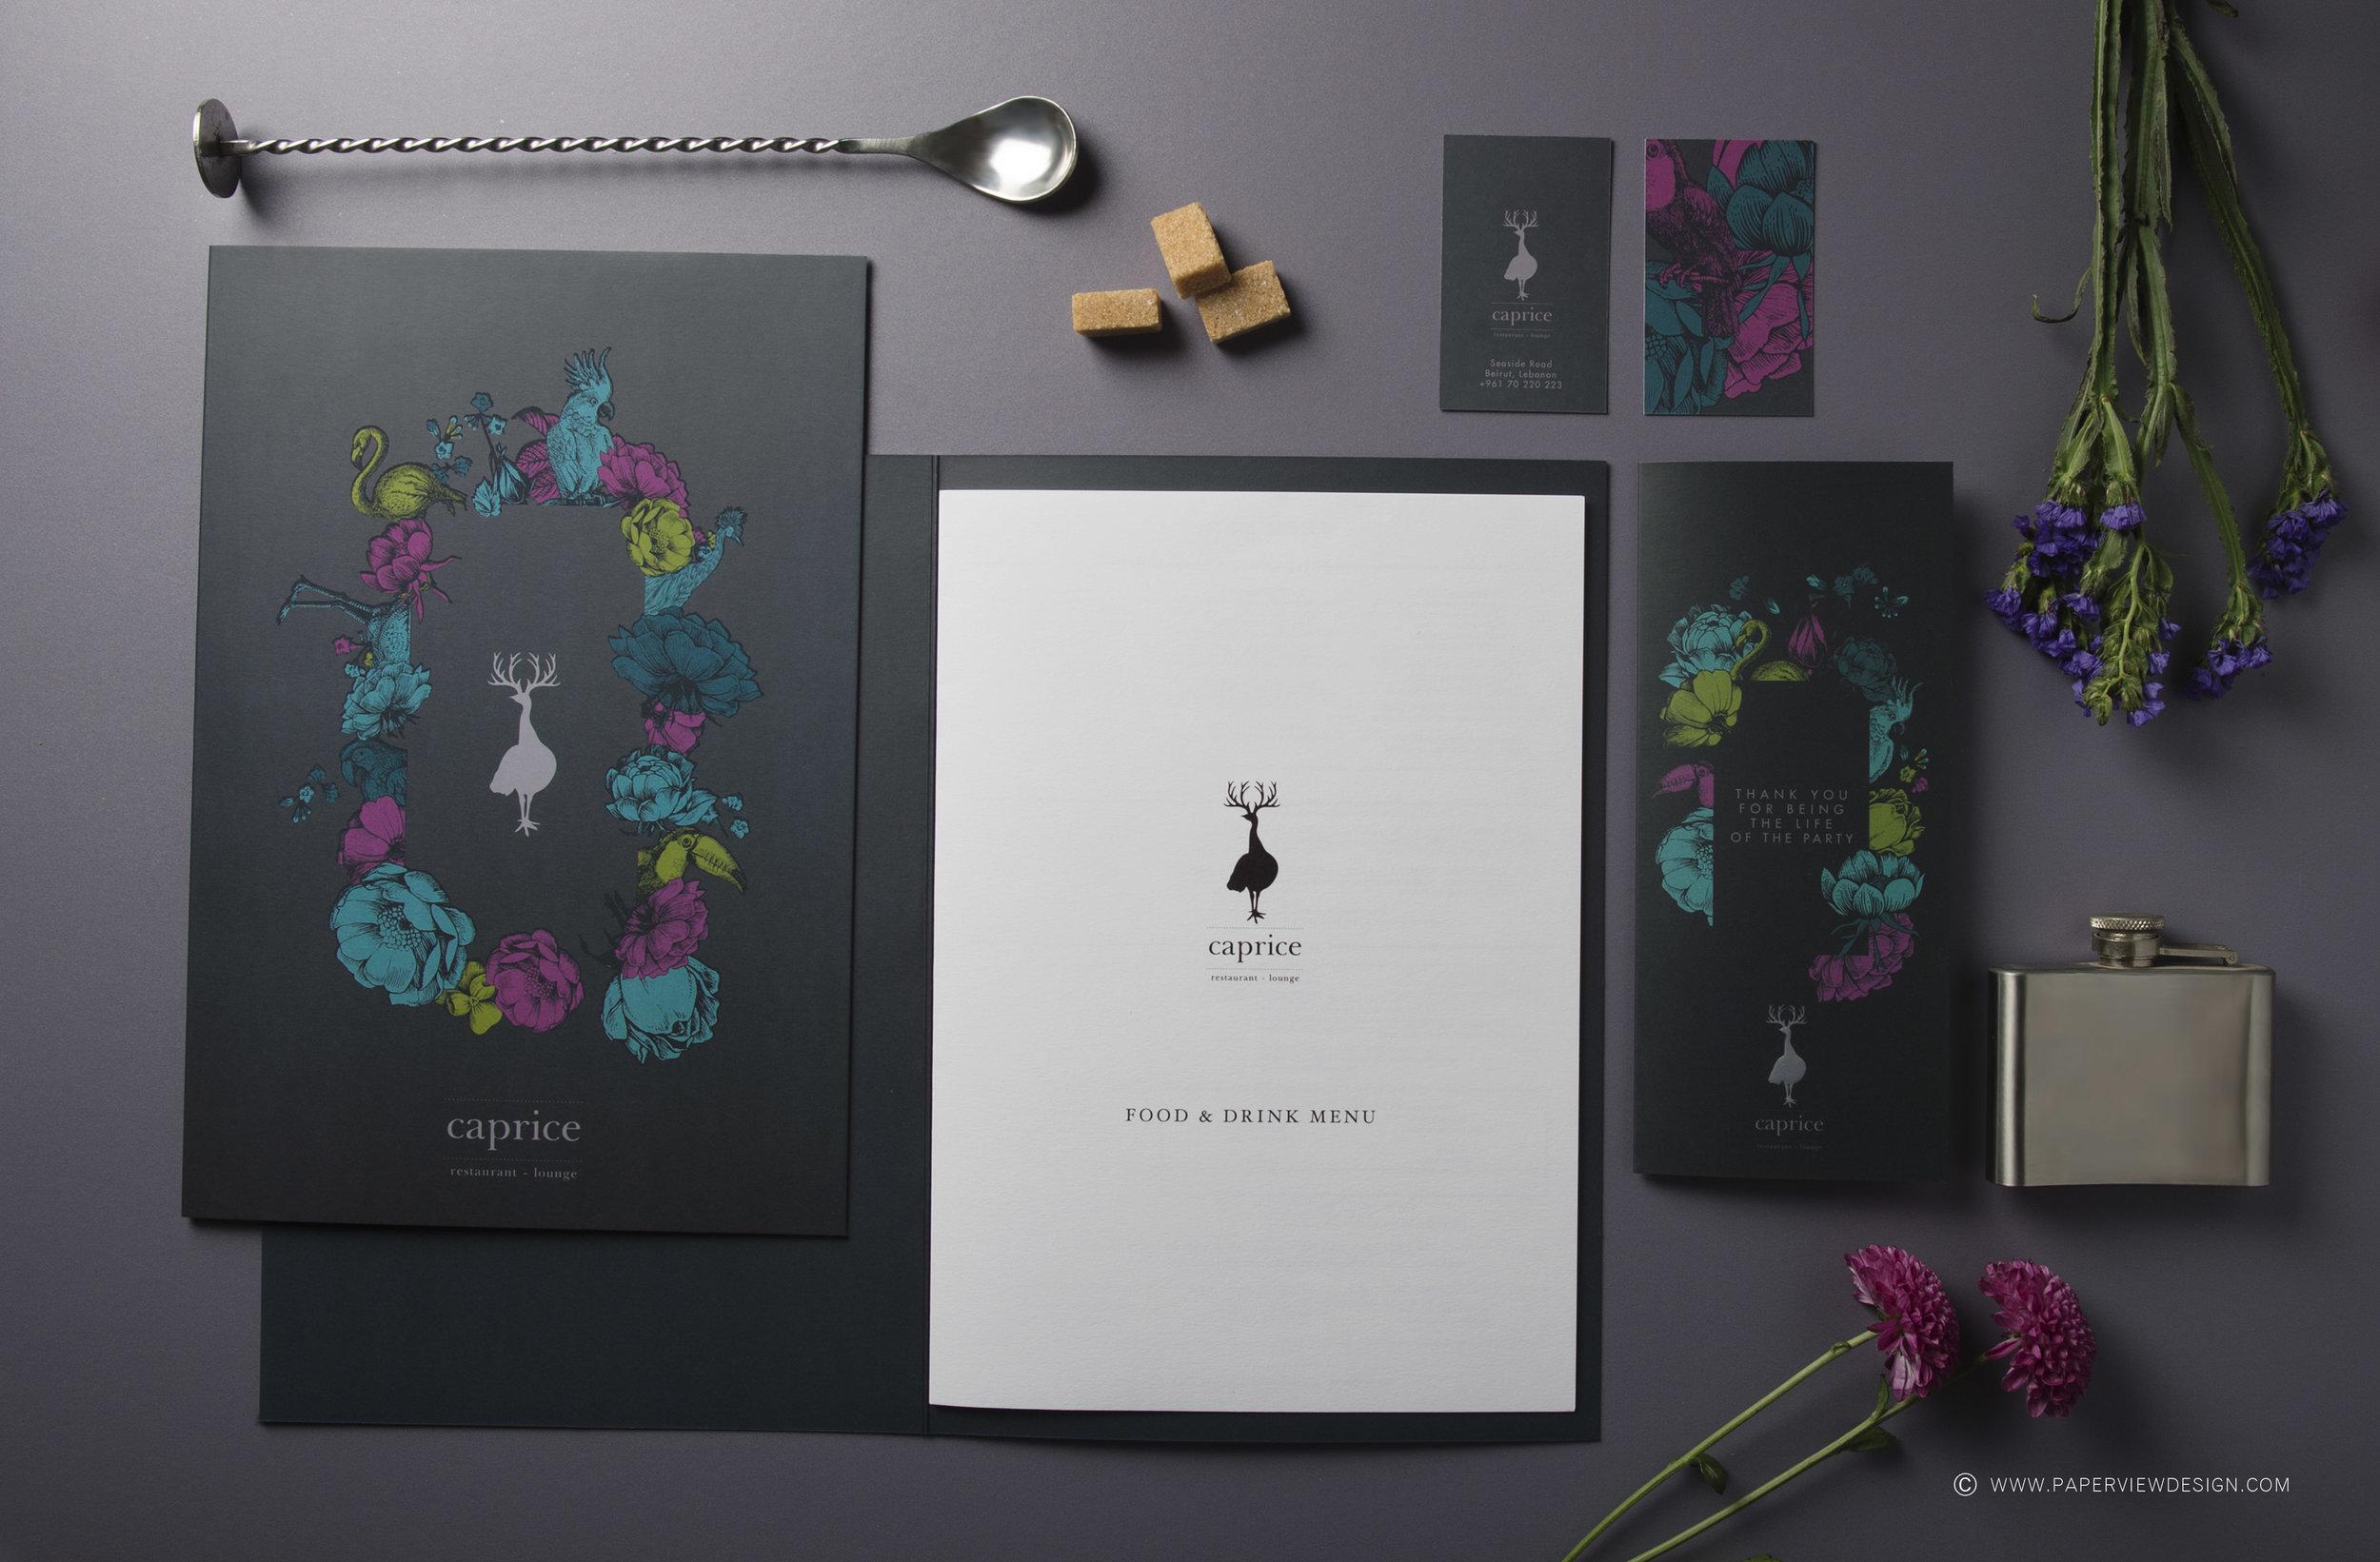 Caprice-Food-Drink-Menu-Inside-Sheets-Foil-Colors-Mood-Board-Flowers-Flask